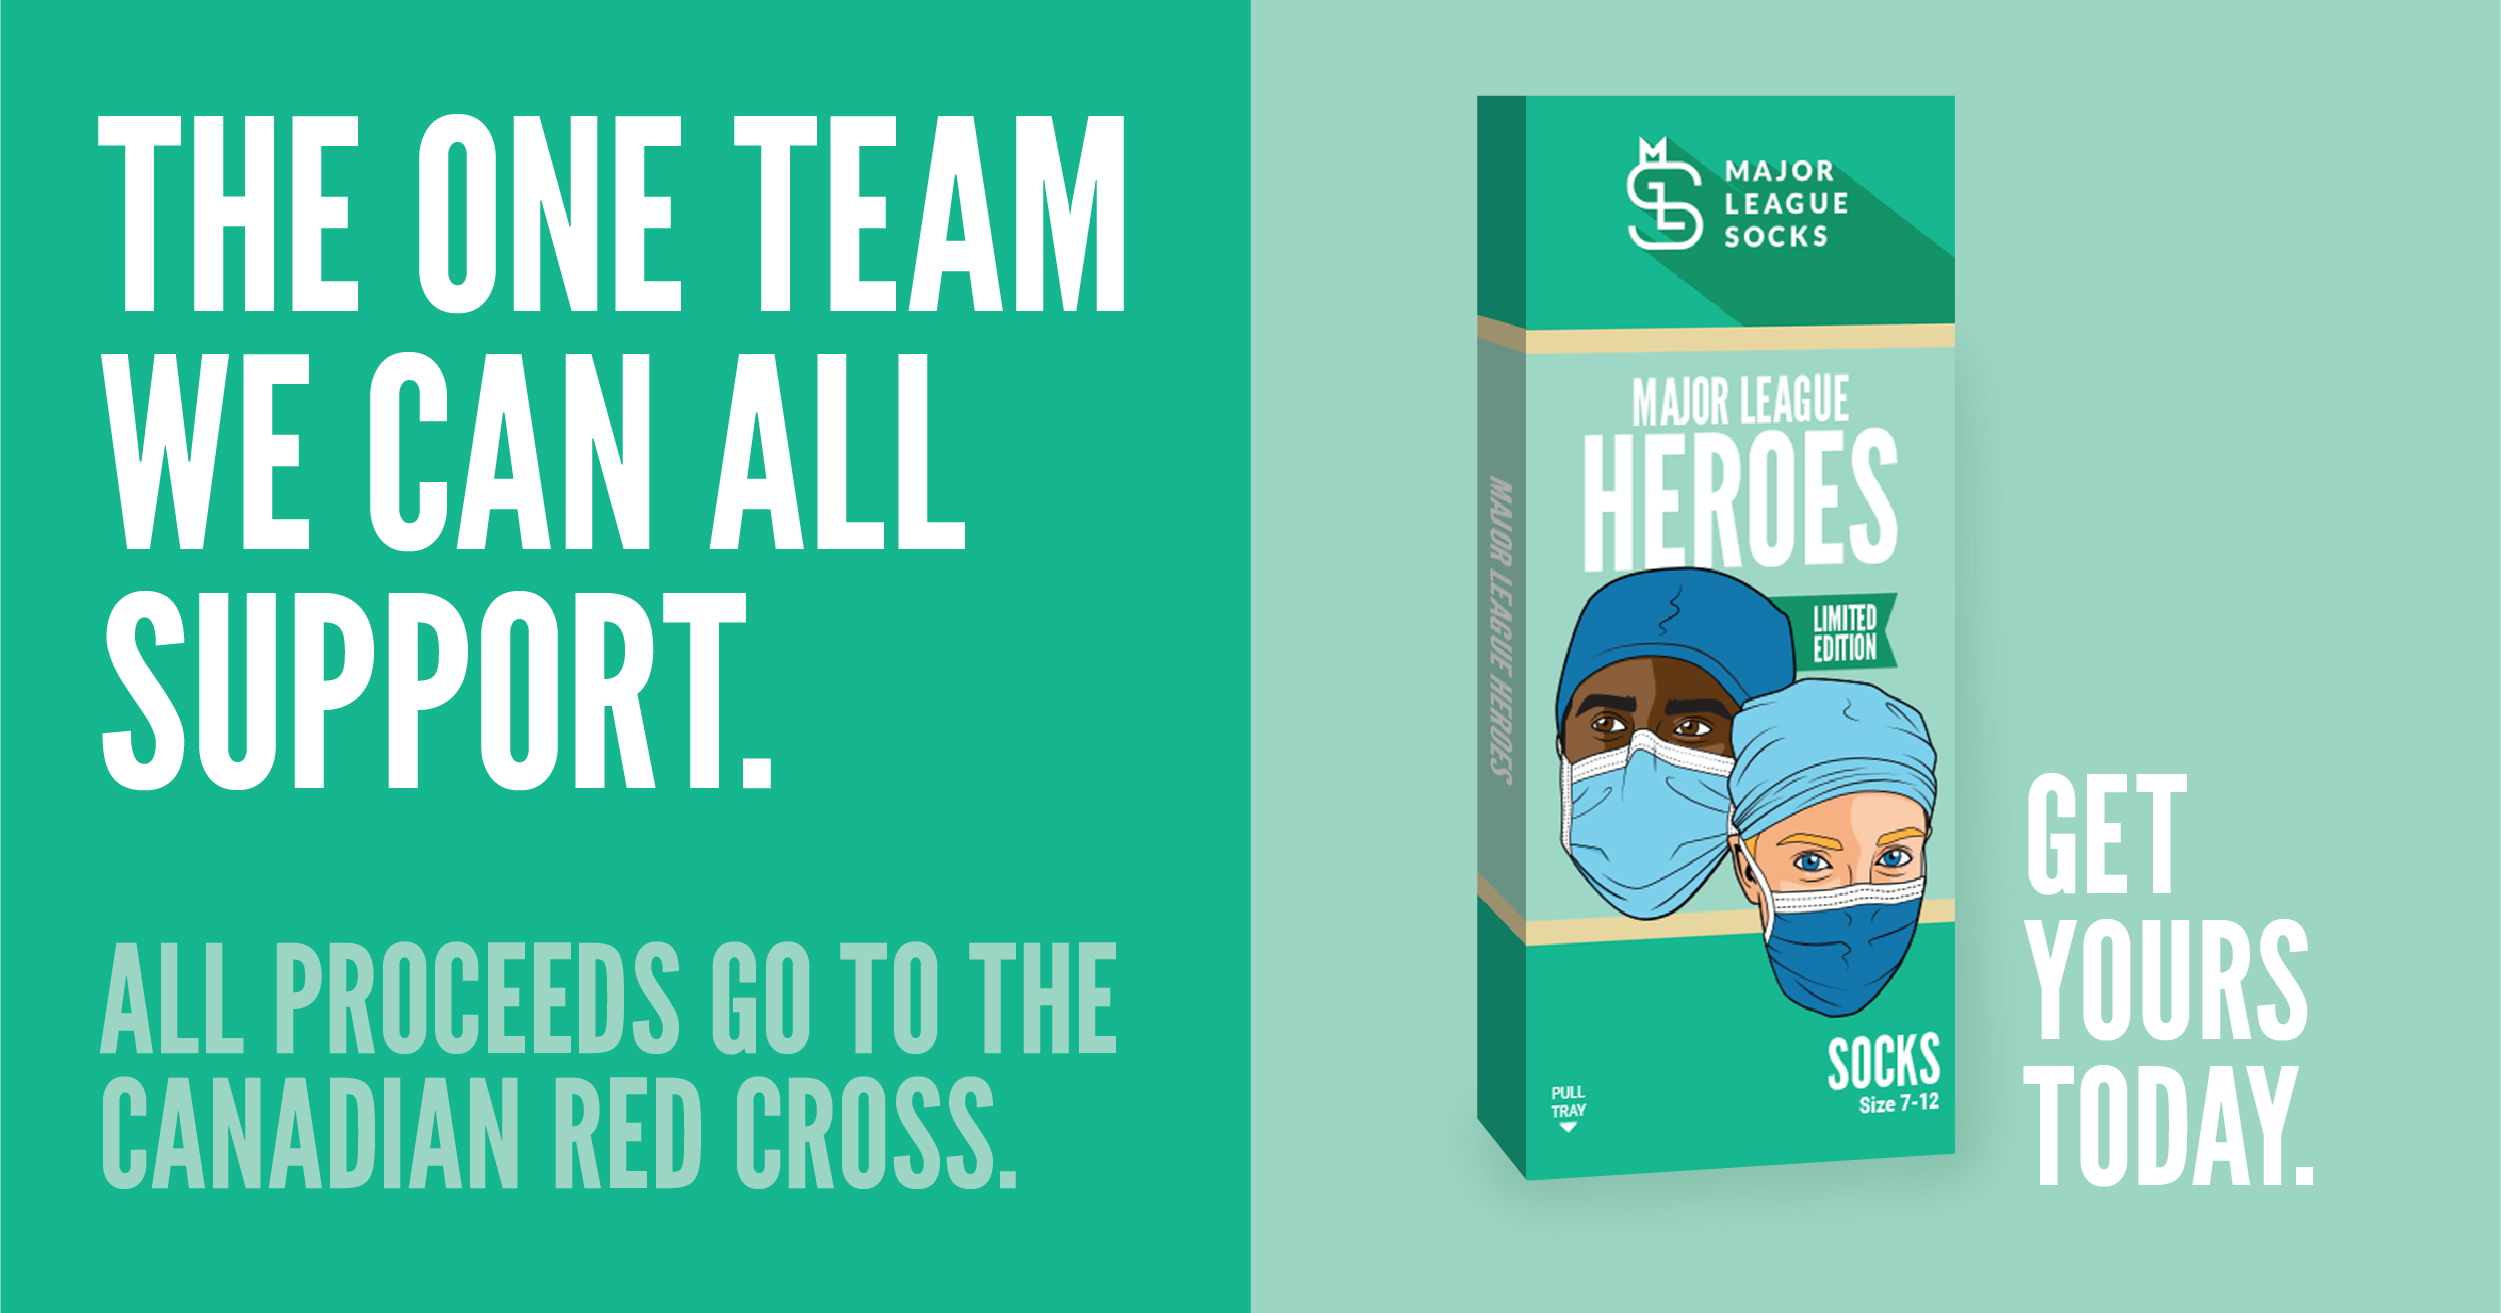 CityNews Toronto: Major League Socks Honouring Health Care Workers With Hero Socks